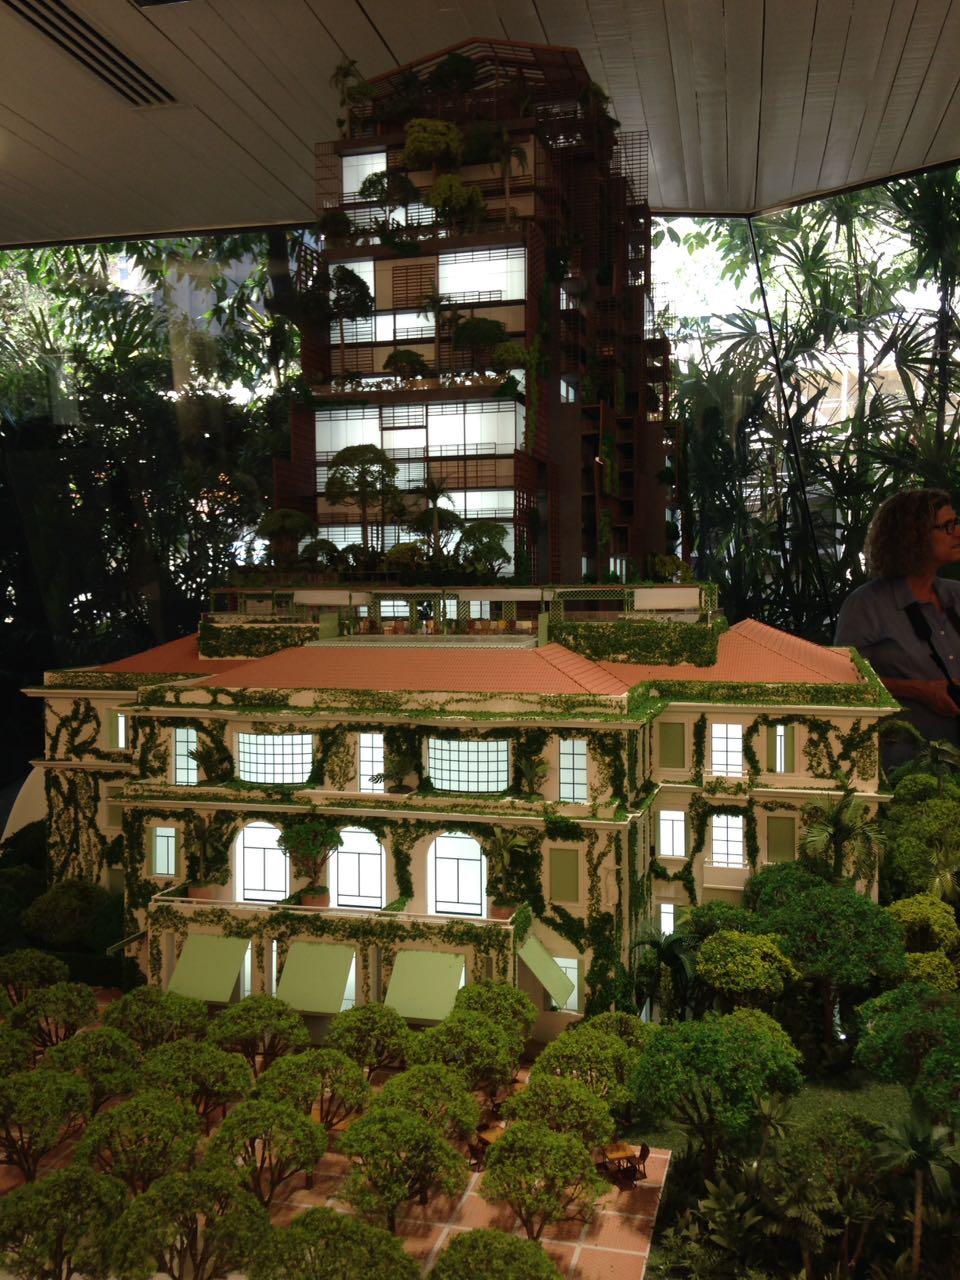 Maquete de como ficará o projeto da Cidade Matarazzo.